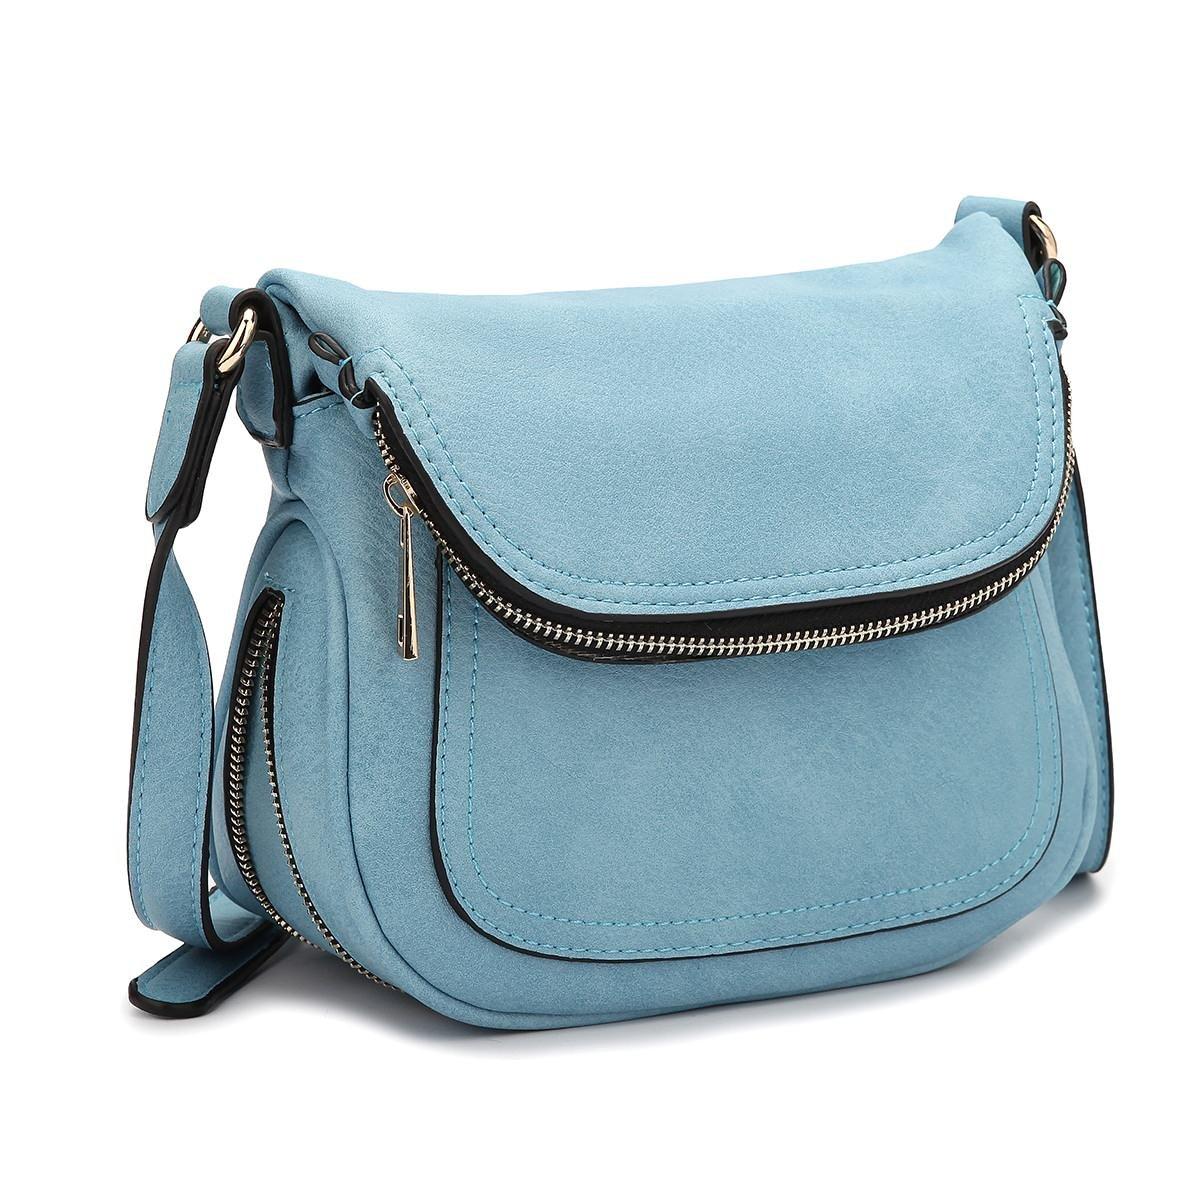 MKY Lightweight Women Leather Saddle Bag Shoulder Crossbody Bag Travel Purse Light Blue